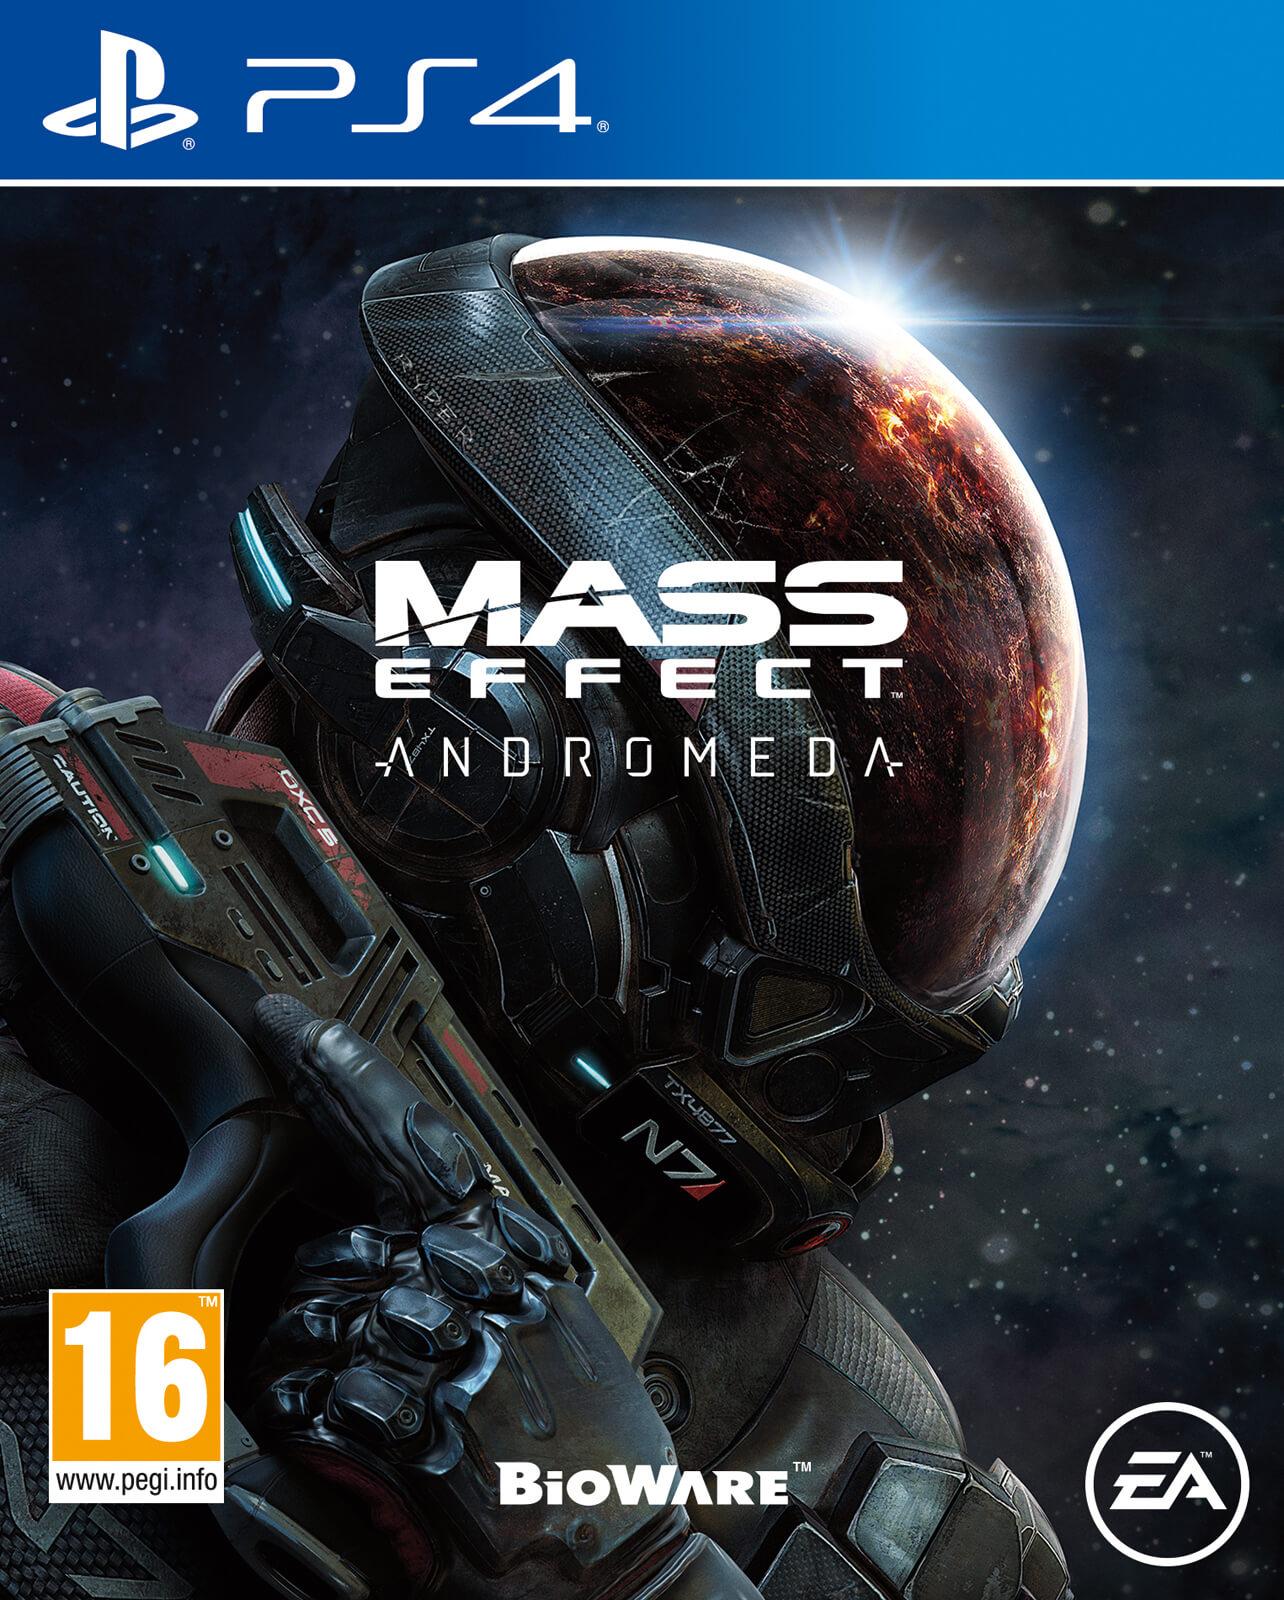 Mass Effect Andromeda PS4 - £7.99 @ Zavvi